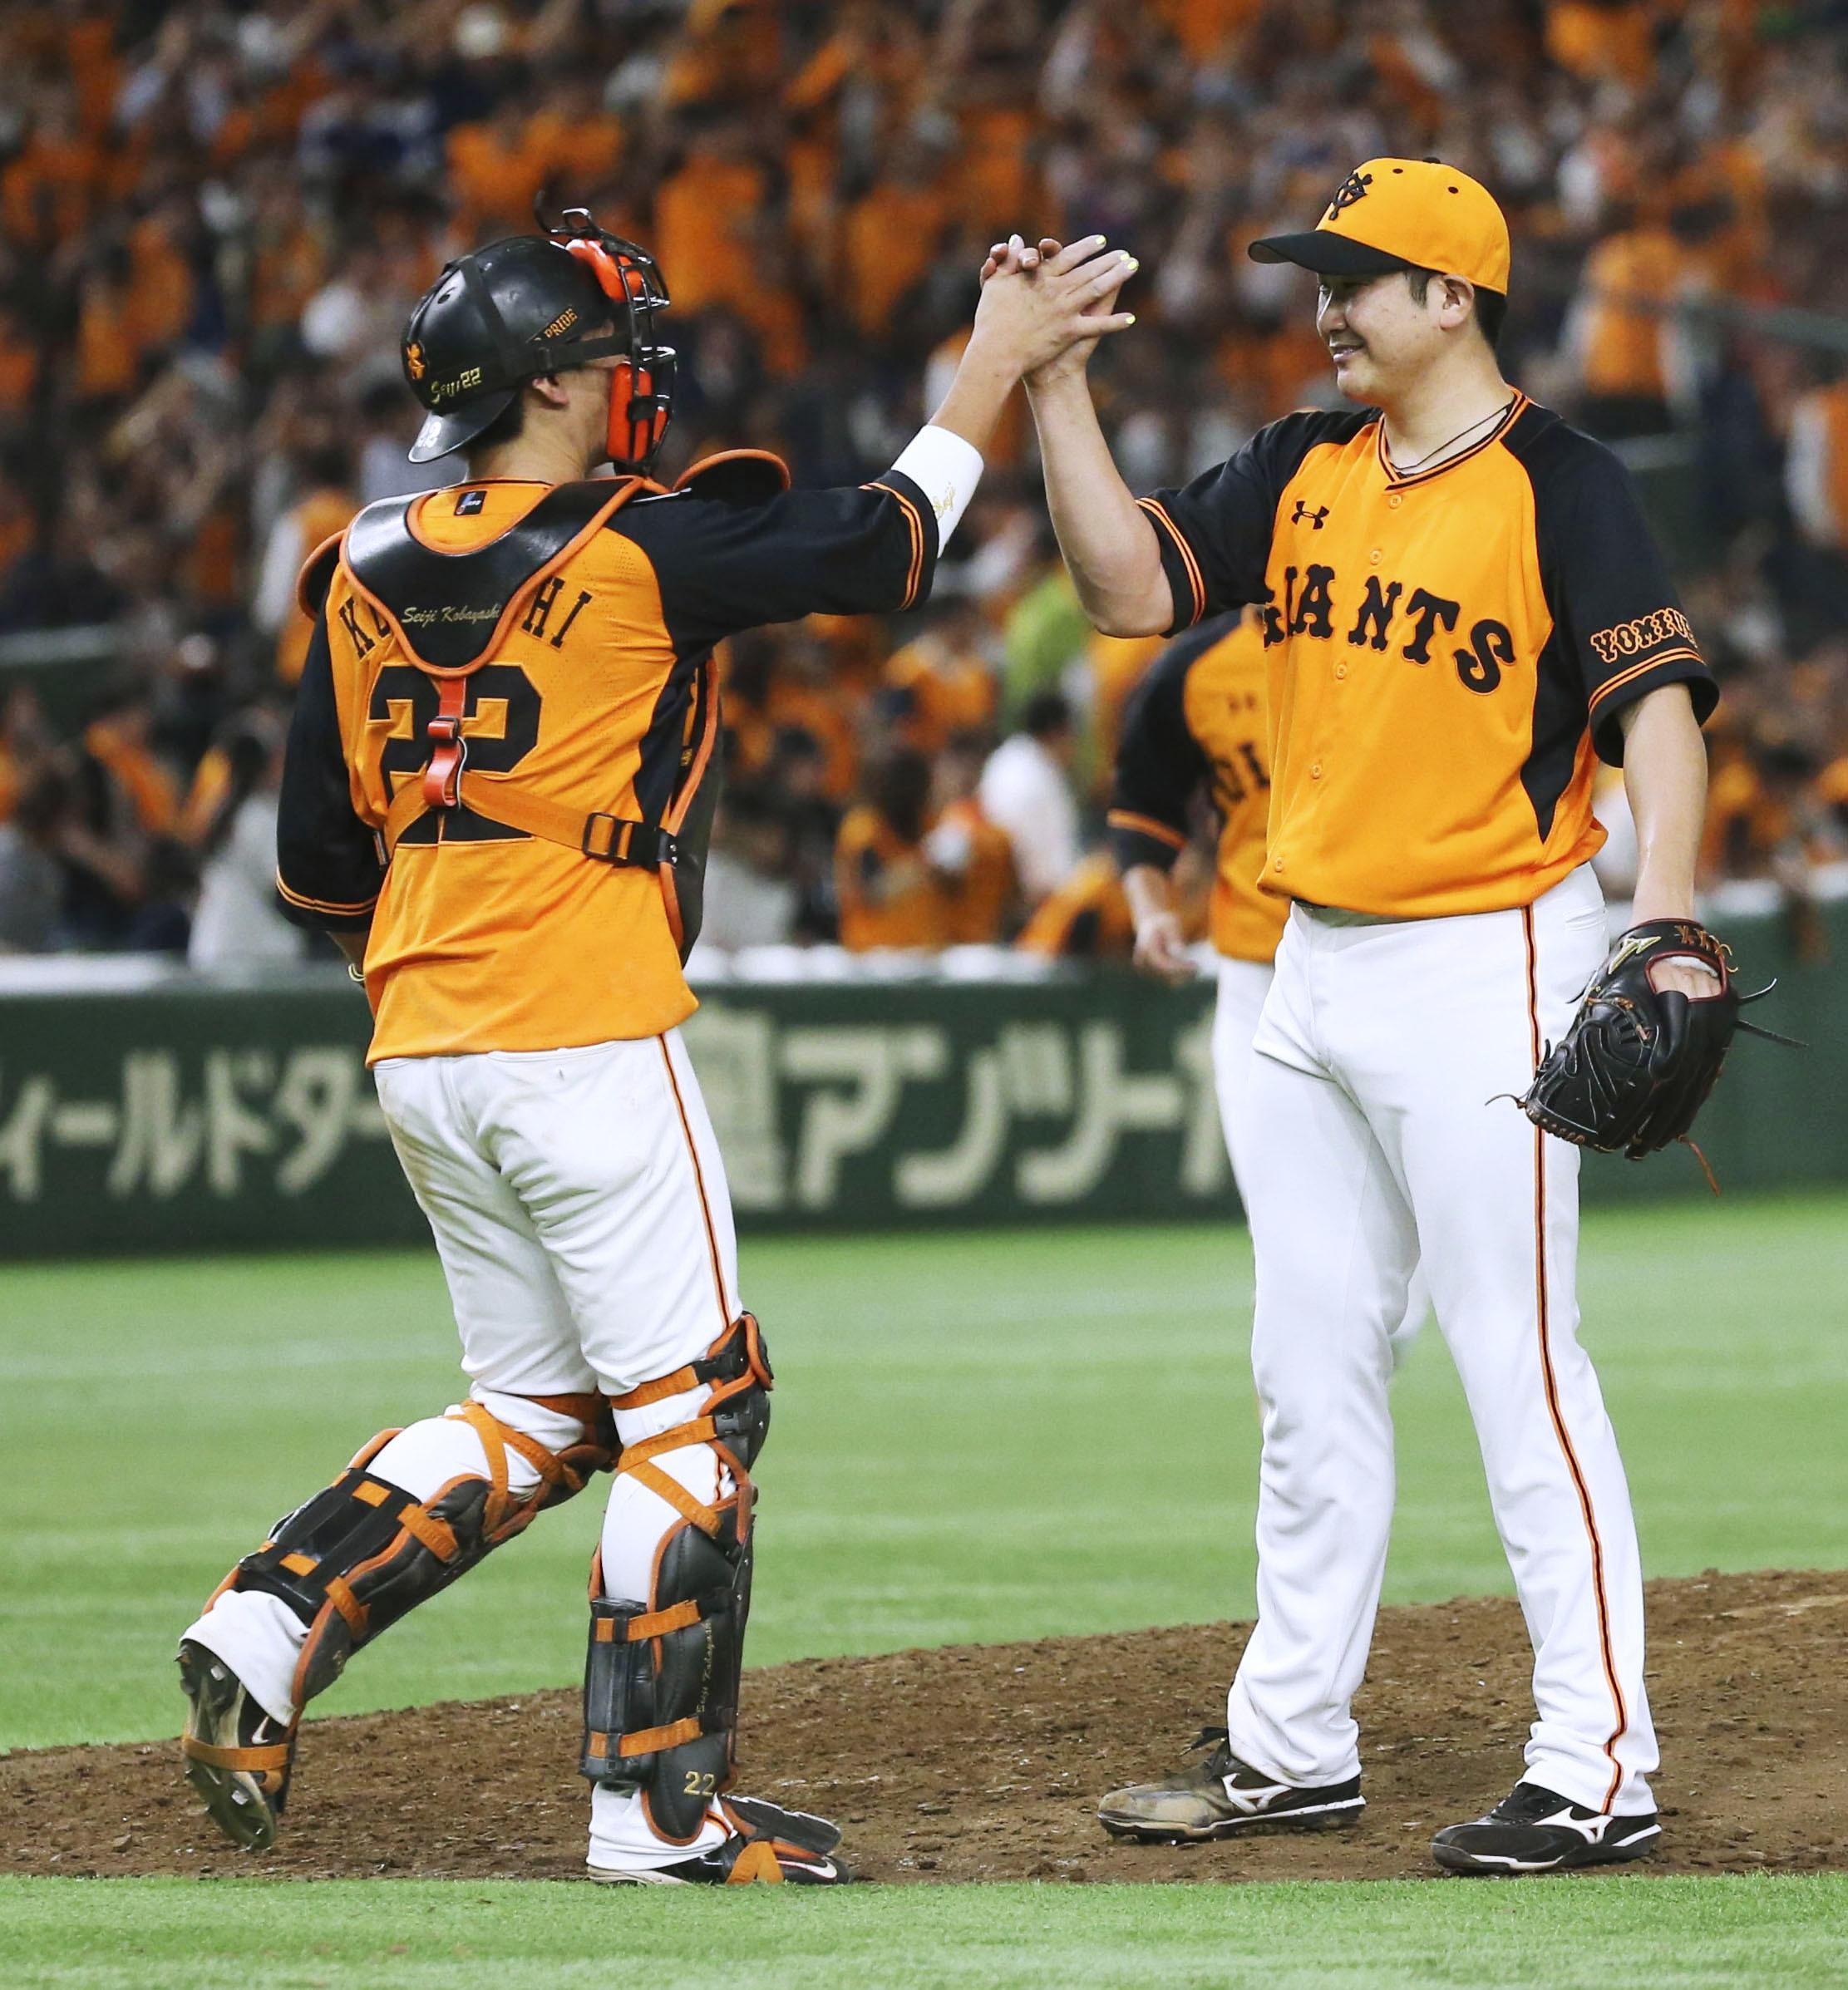 BASEBALL GATE              プロ野球            完全無欠!読売巨人・菅野が27イニング連続無失点で今季2度目の完封勝ち!